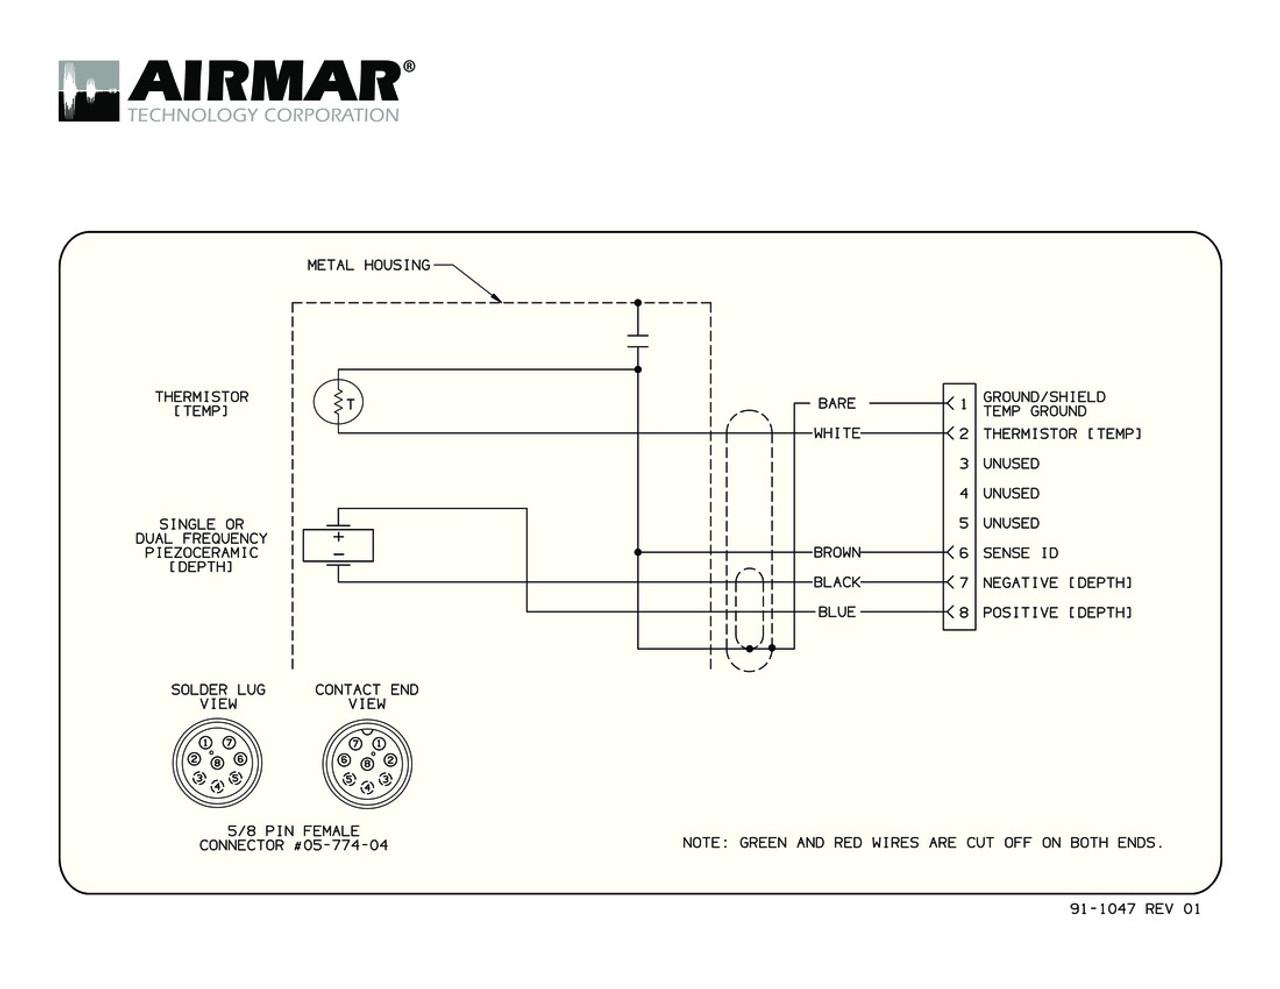 small resolution of garmin 3205 wiring diagram wire management wiring diagram wiring diagram for garmin 3205